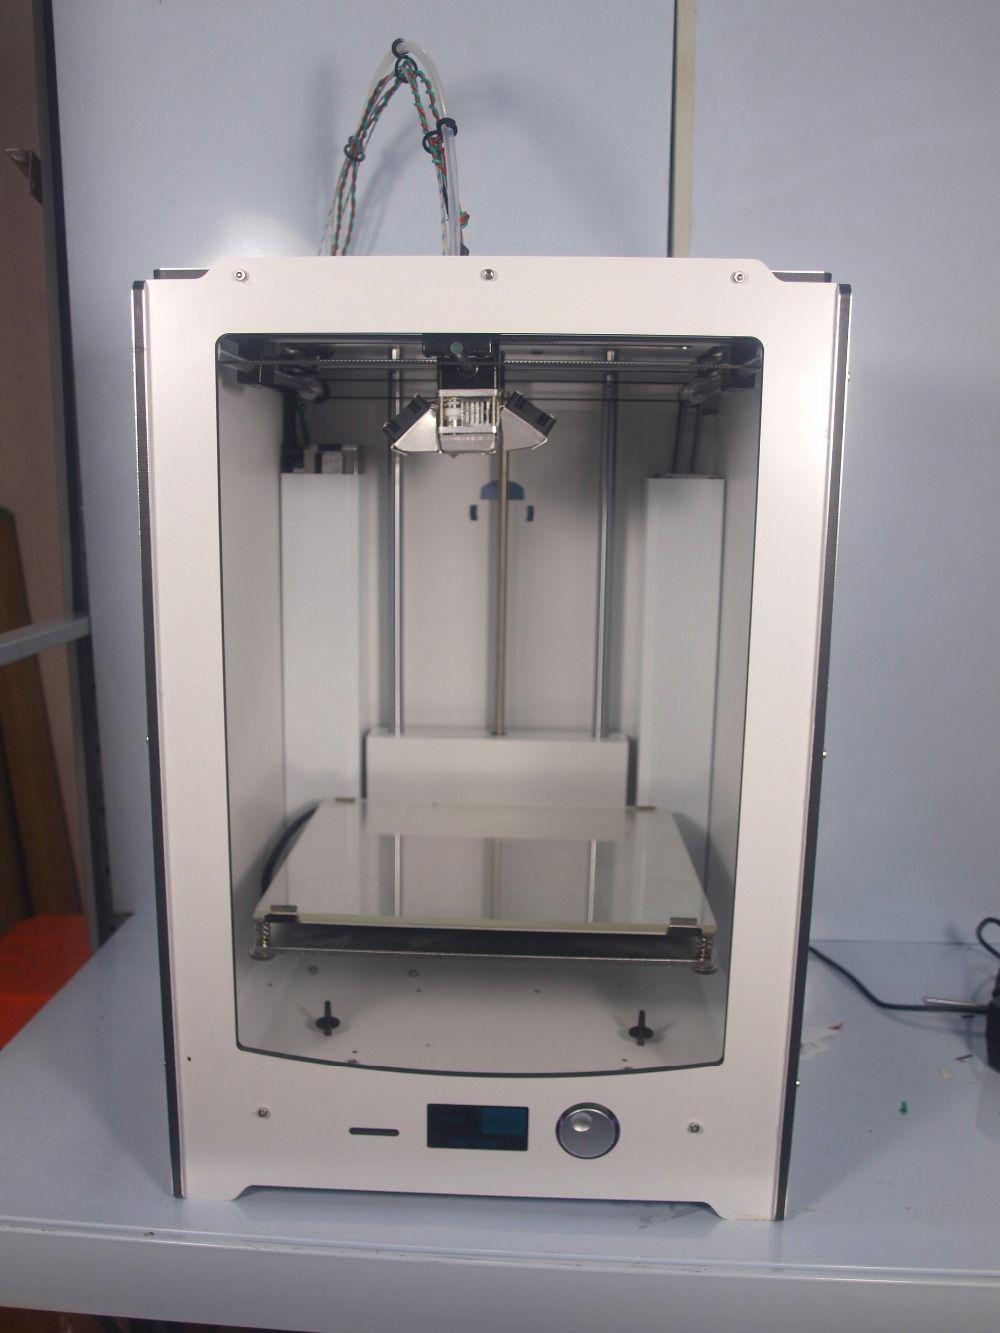 Blurolls Ultimaker 2 extended 3D printer DIY full kit(not assemble) Ultimaker2 Extended dual nozzles 3 D printer,dual extruders